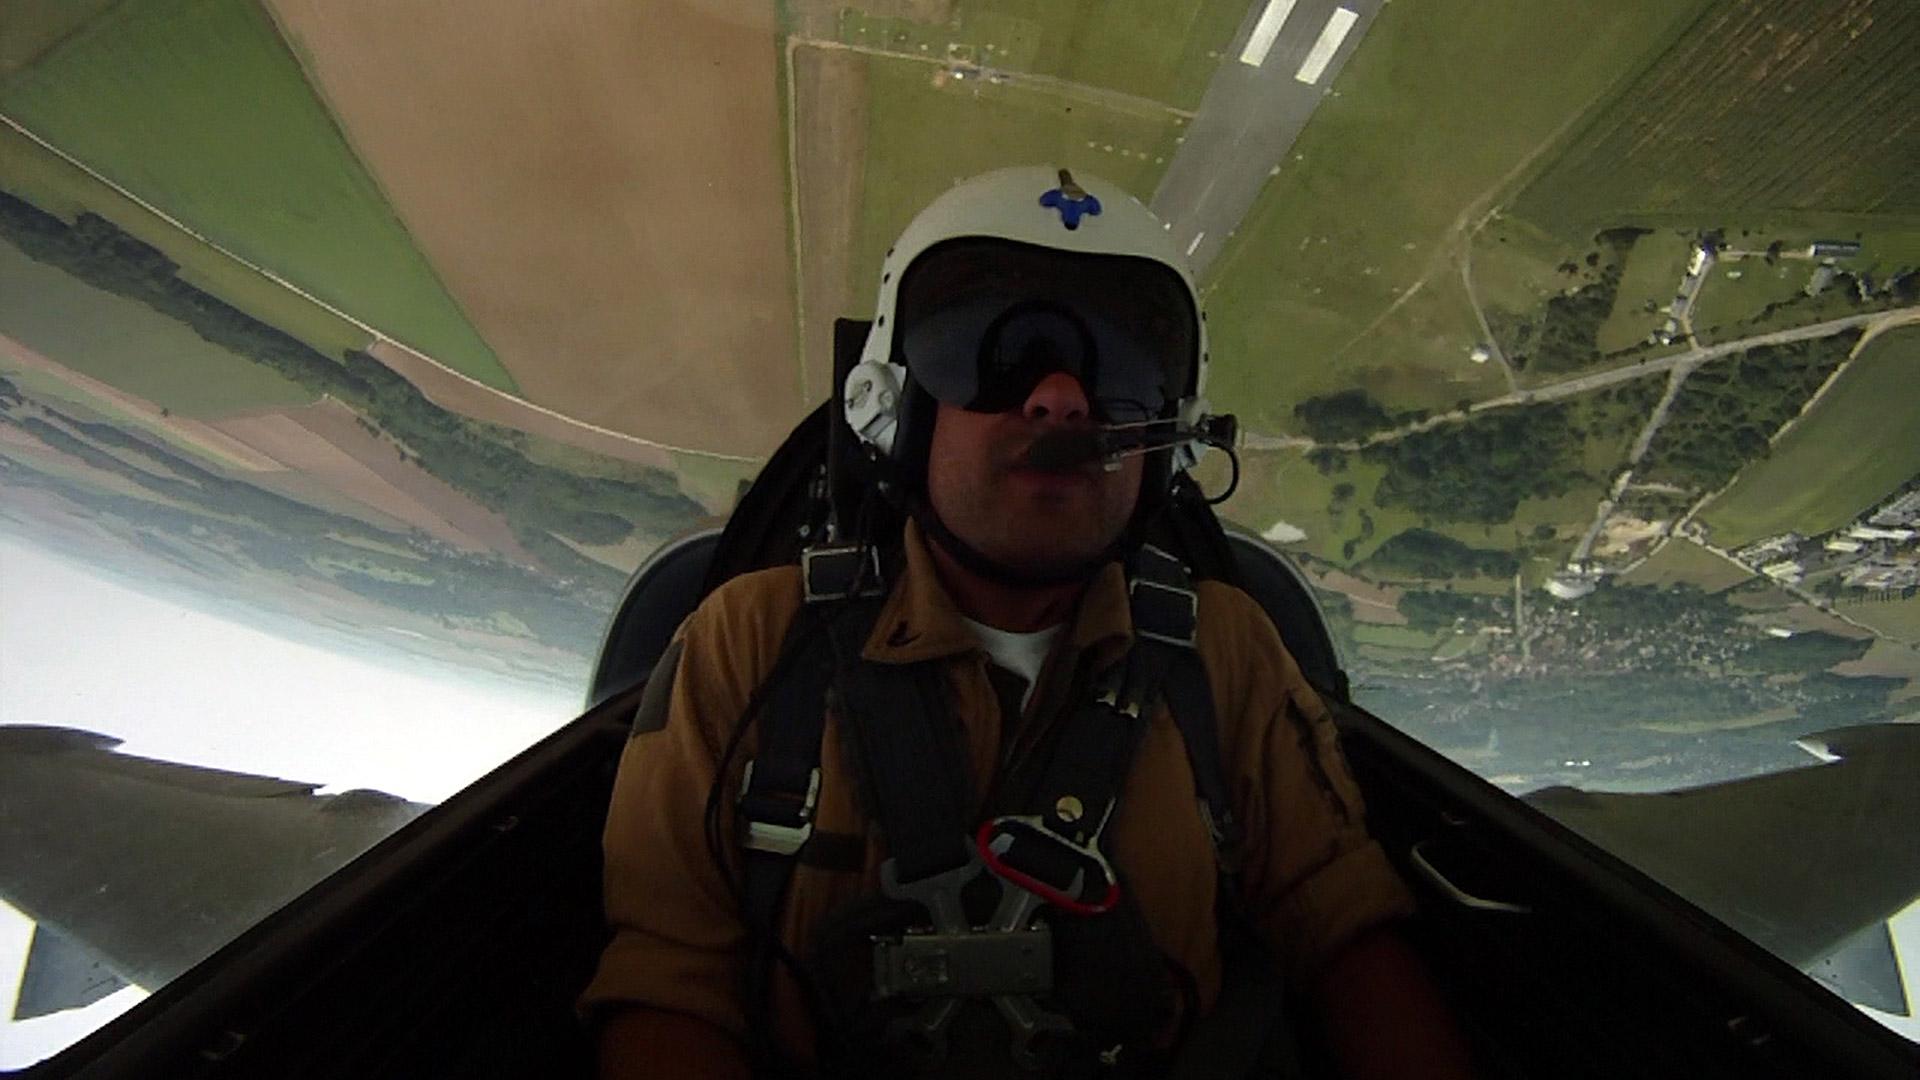 vol en avion de chasse l39 angleterre